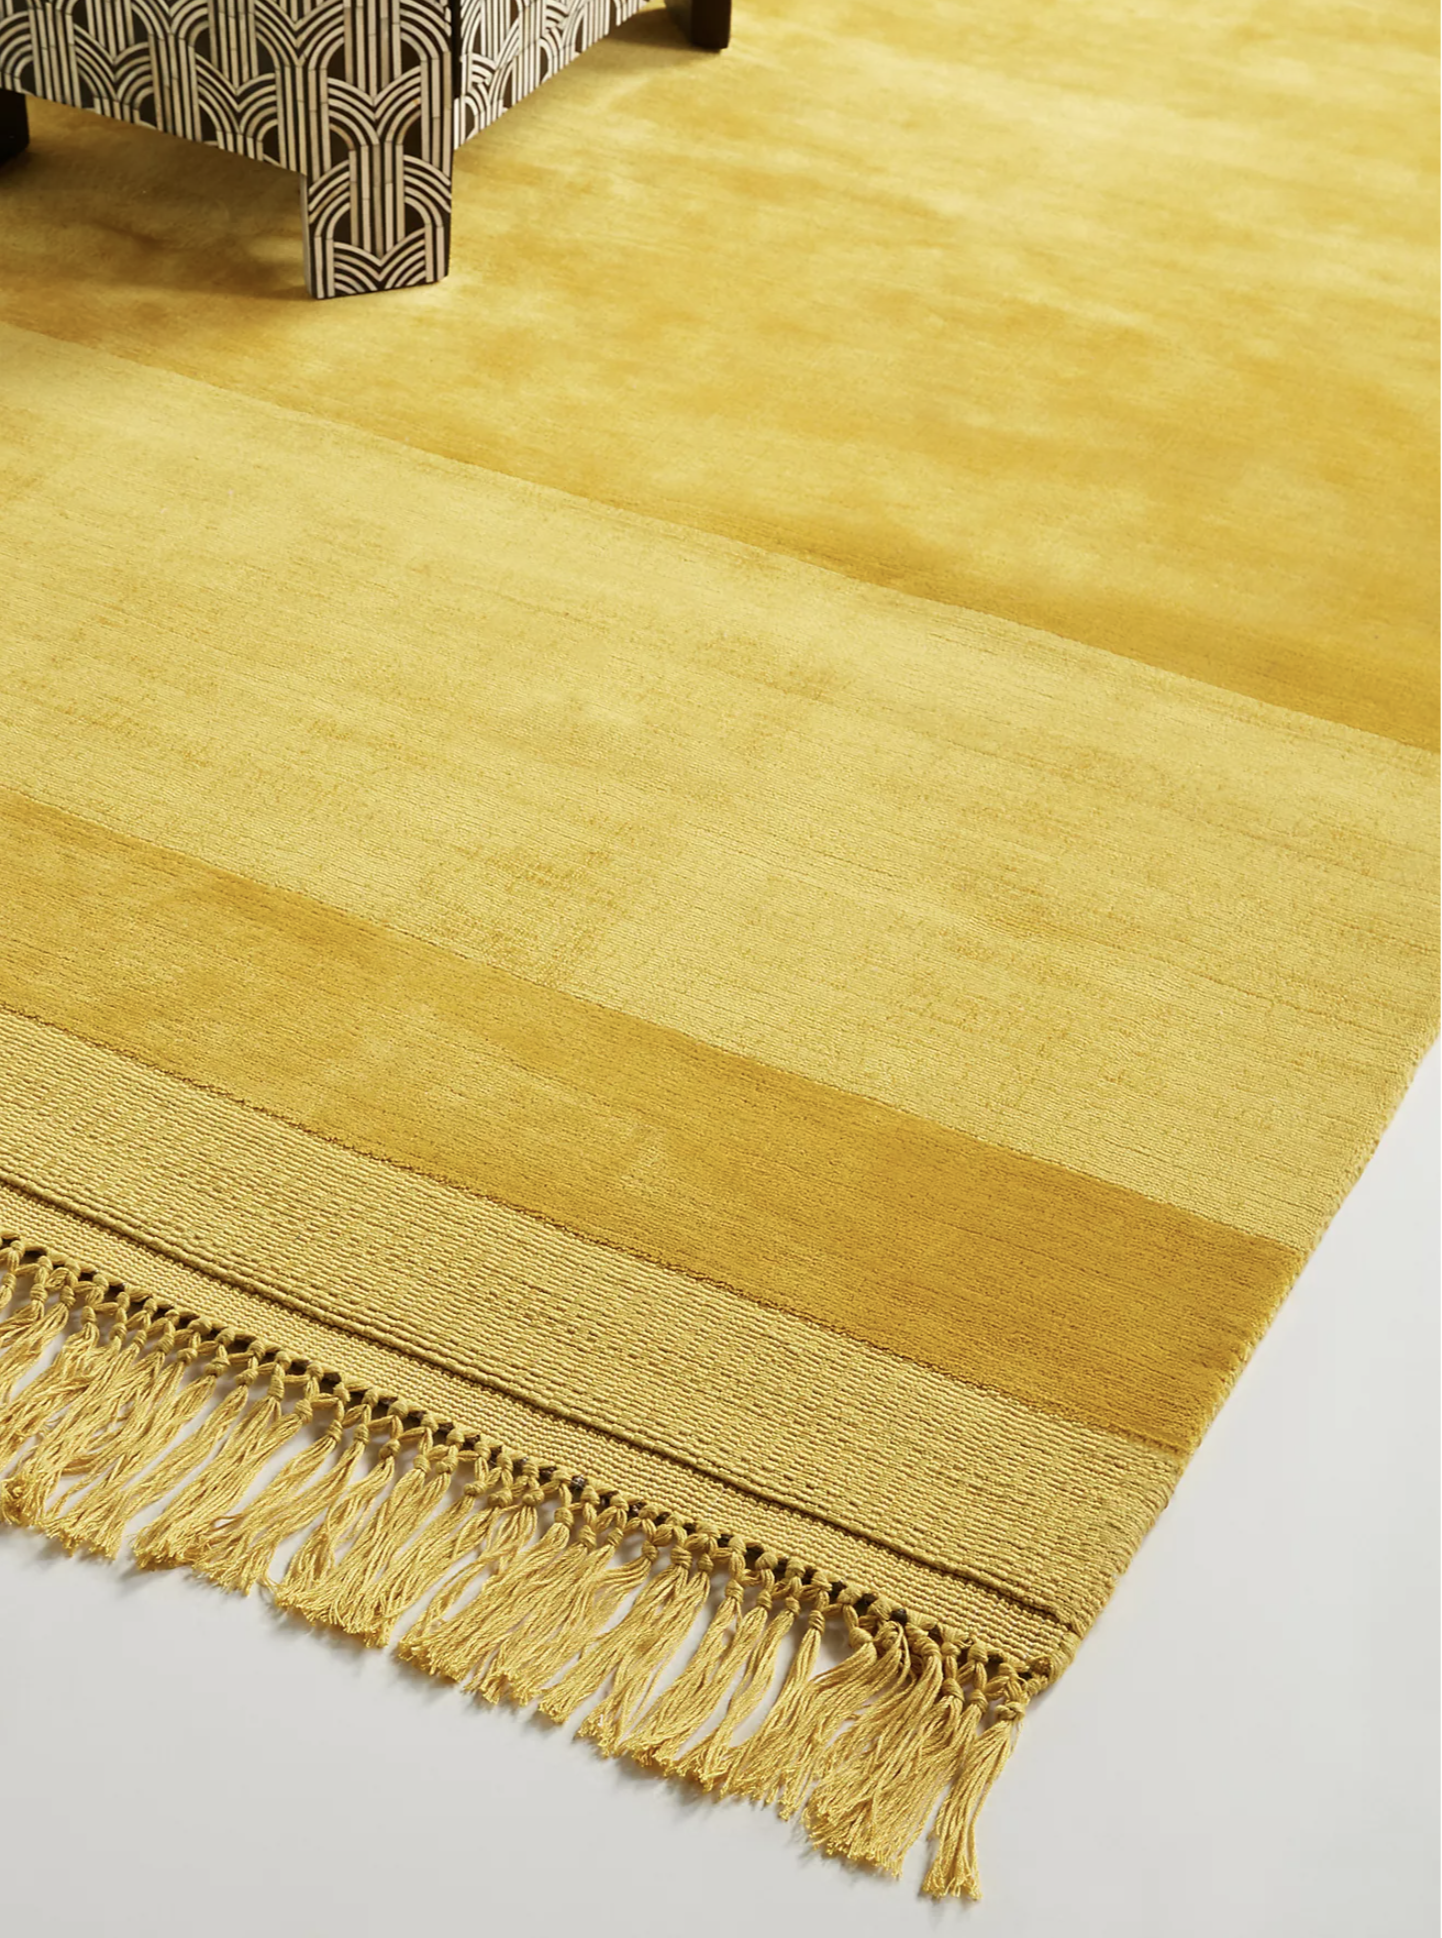 Handloomed Striped Viscose Rug in Maize via Anthropologie